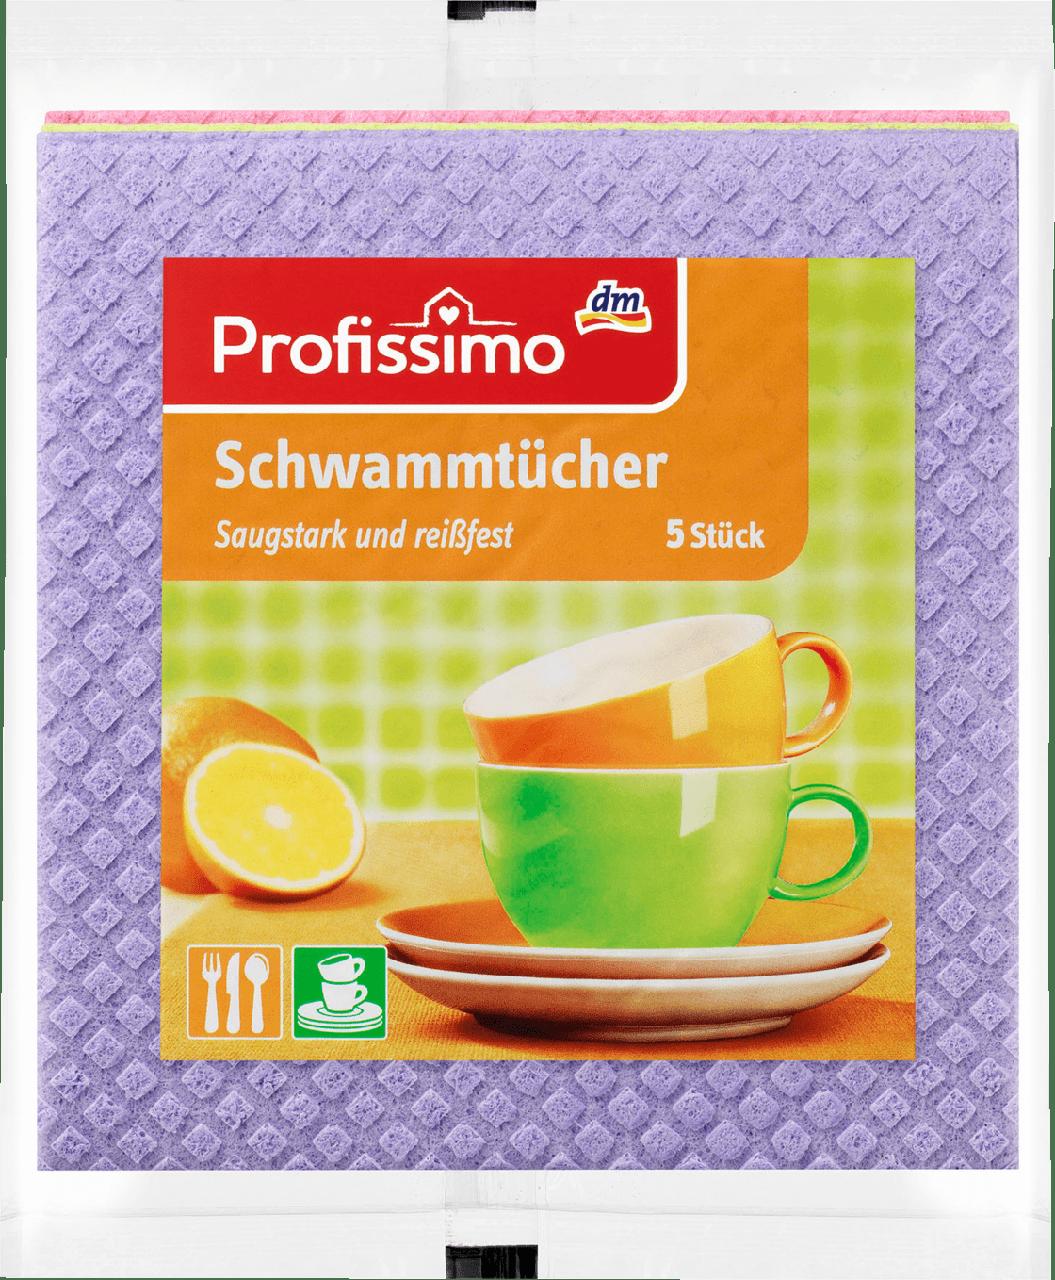 Губчатые салфетки для дома Profissimo, 5 шт.